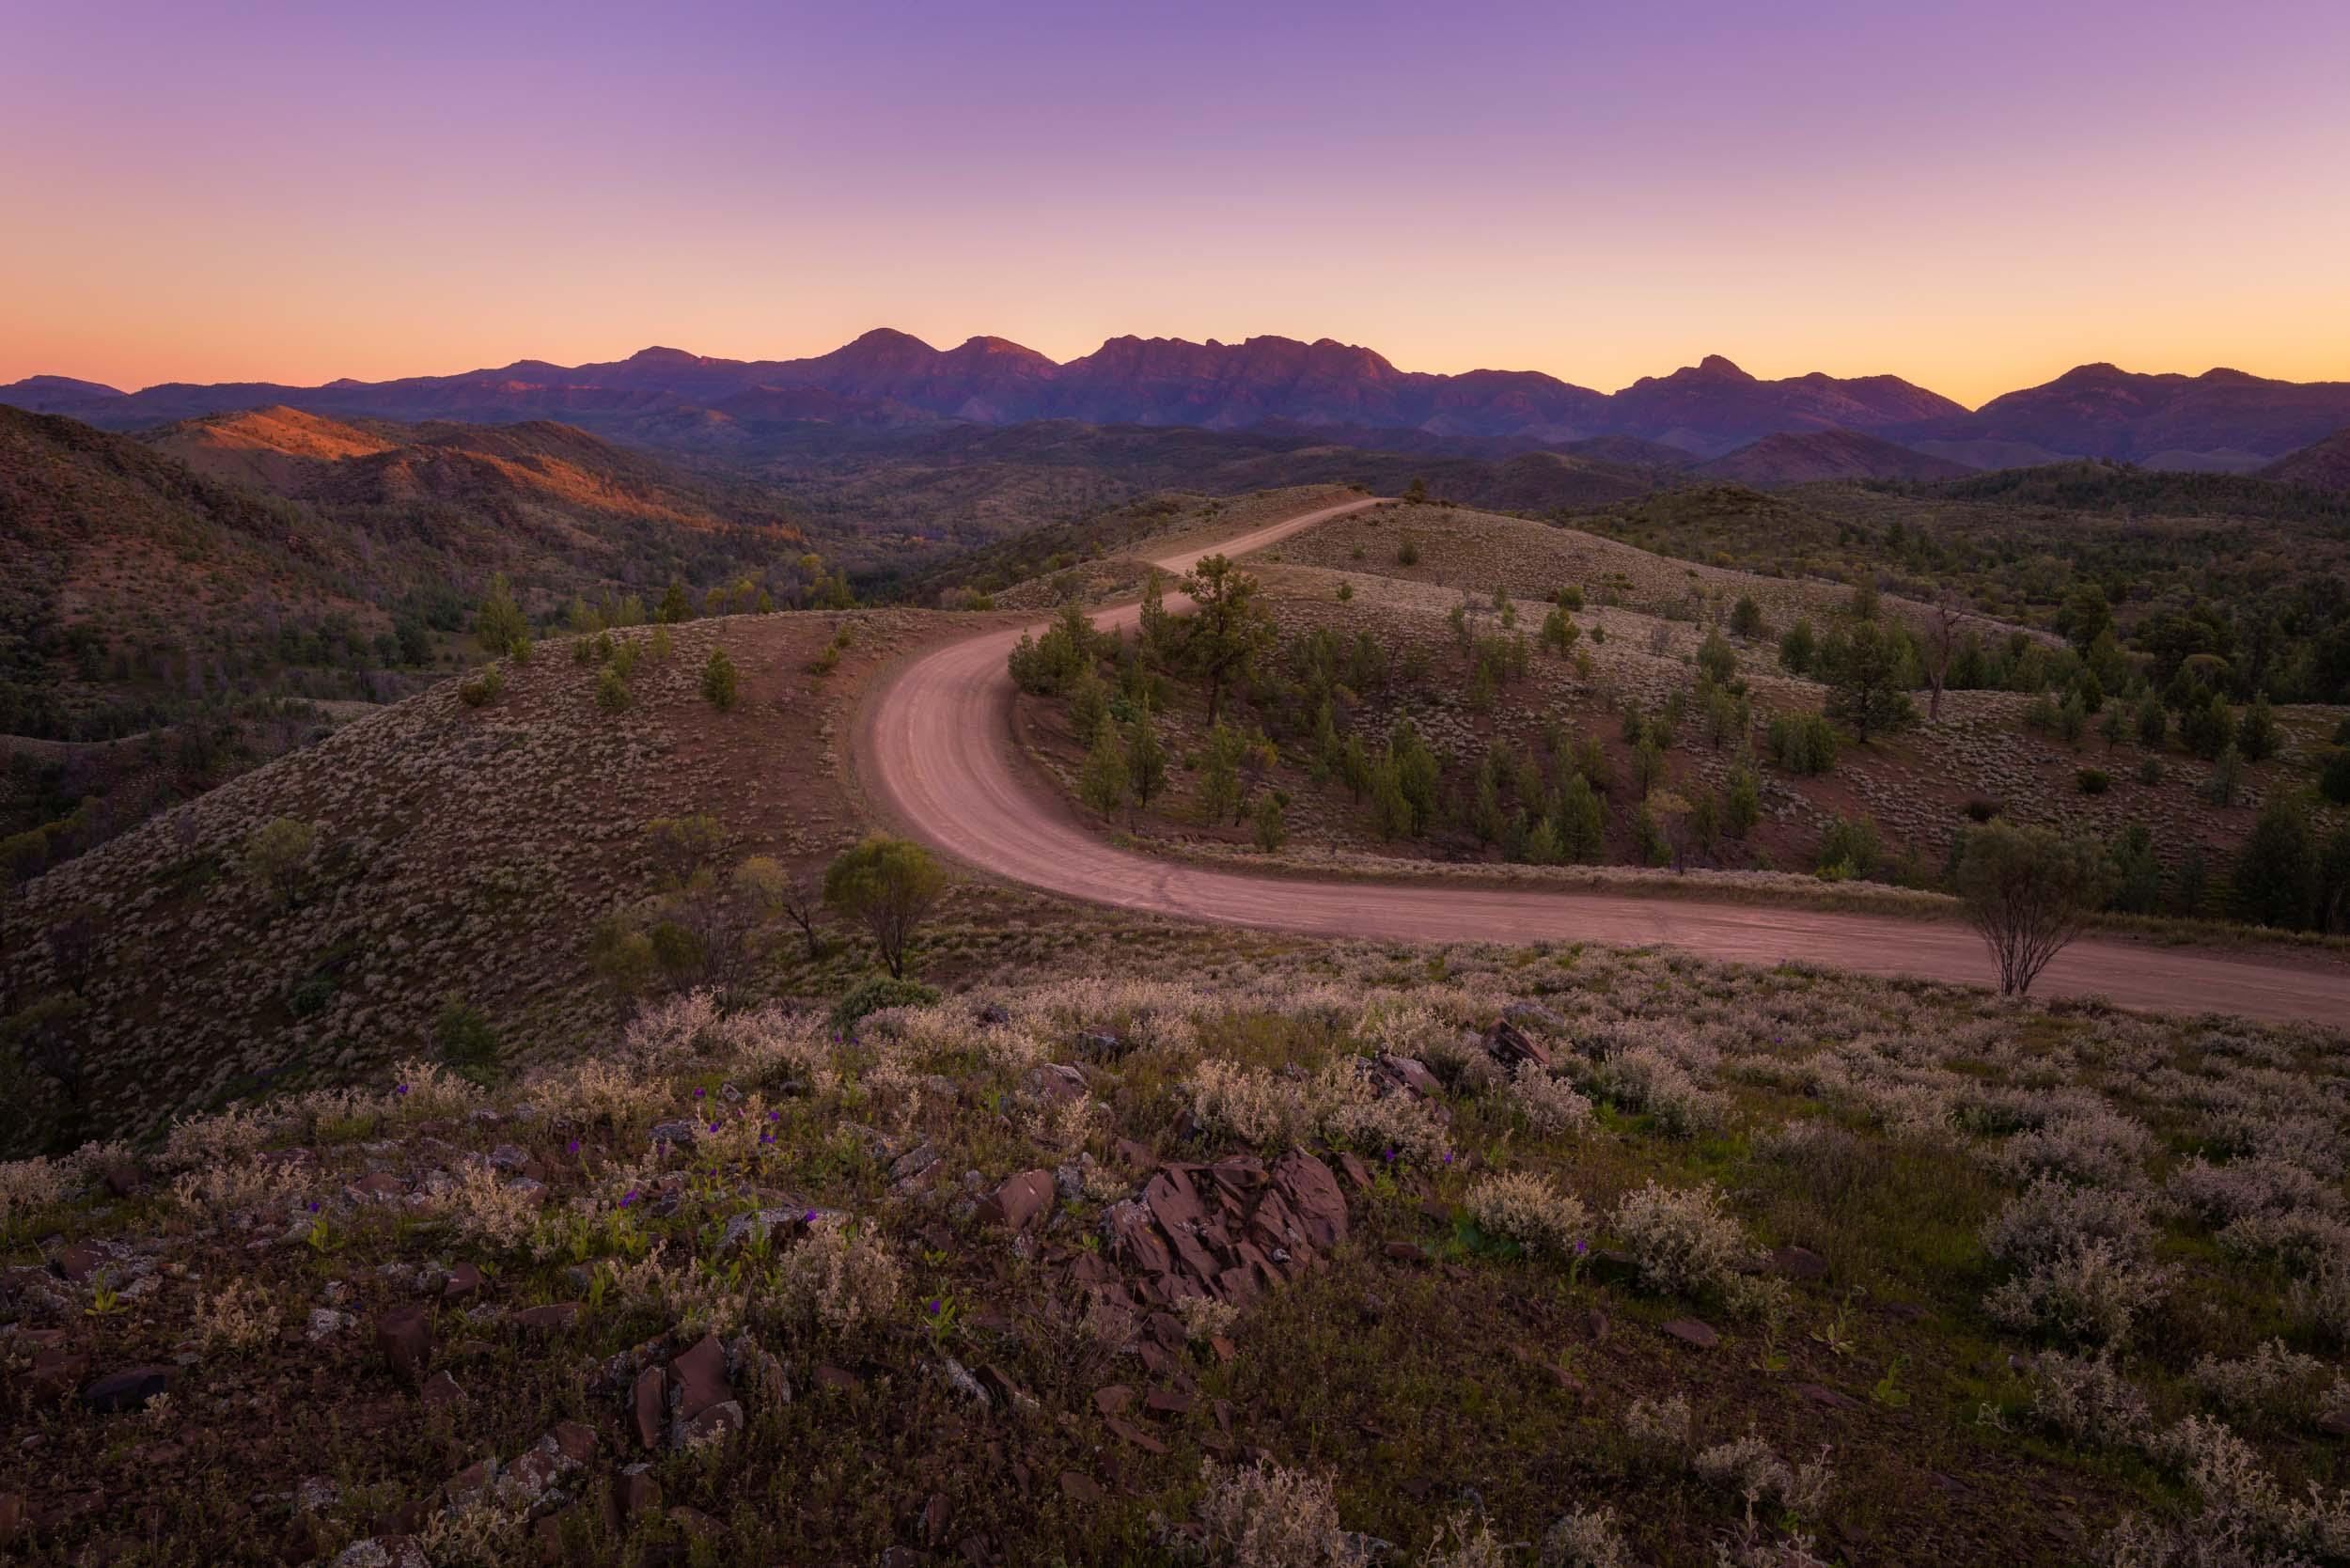 Razorback Lookout @ Wilpena Pound, Flinders Ranges